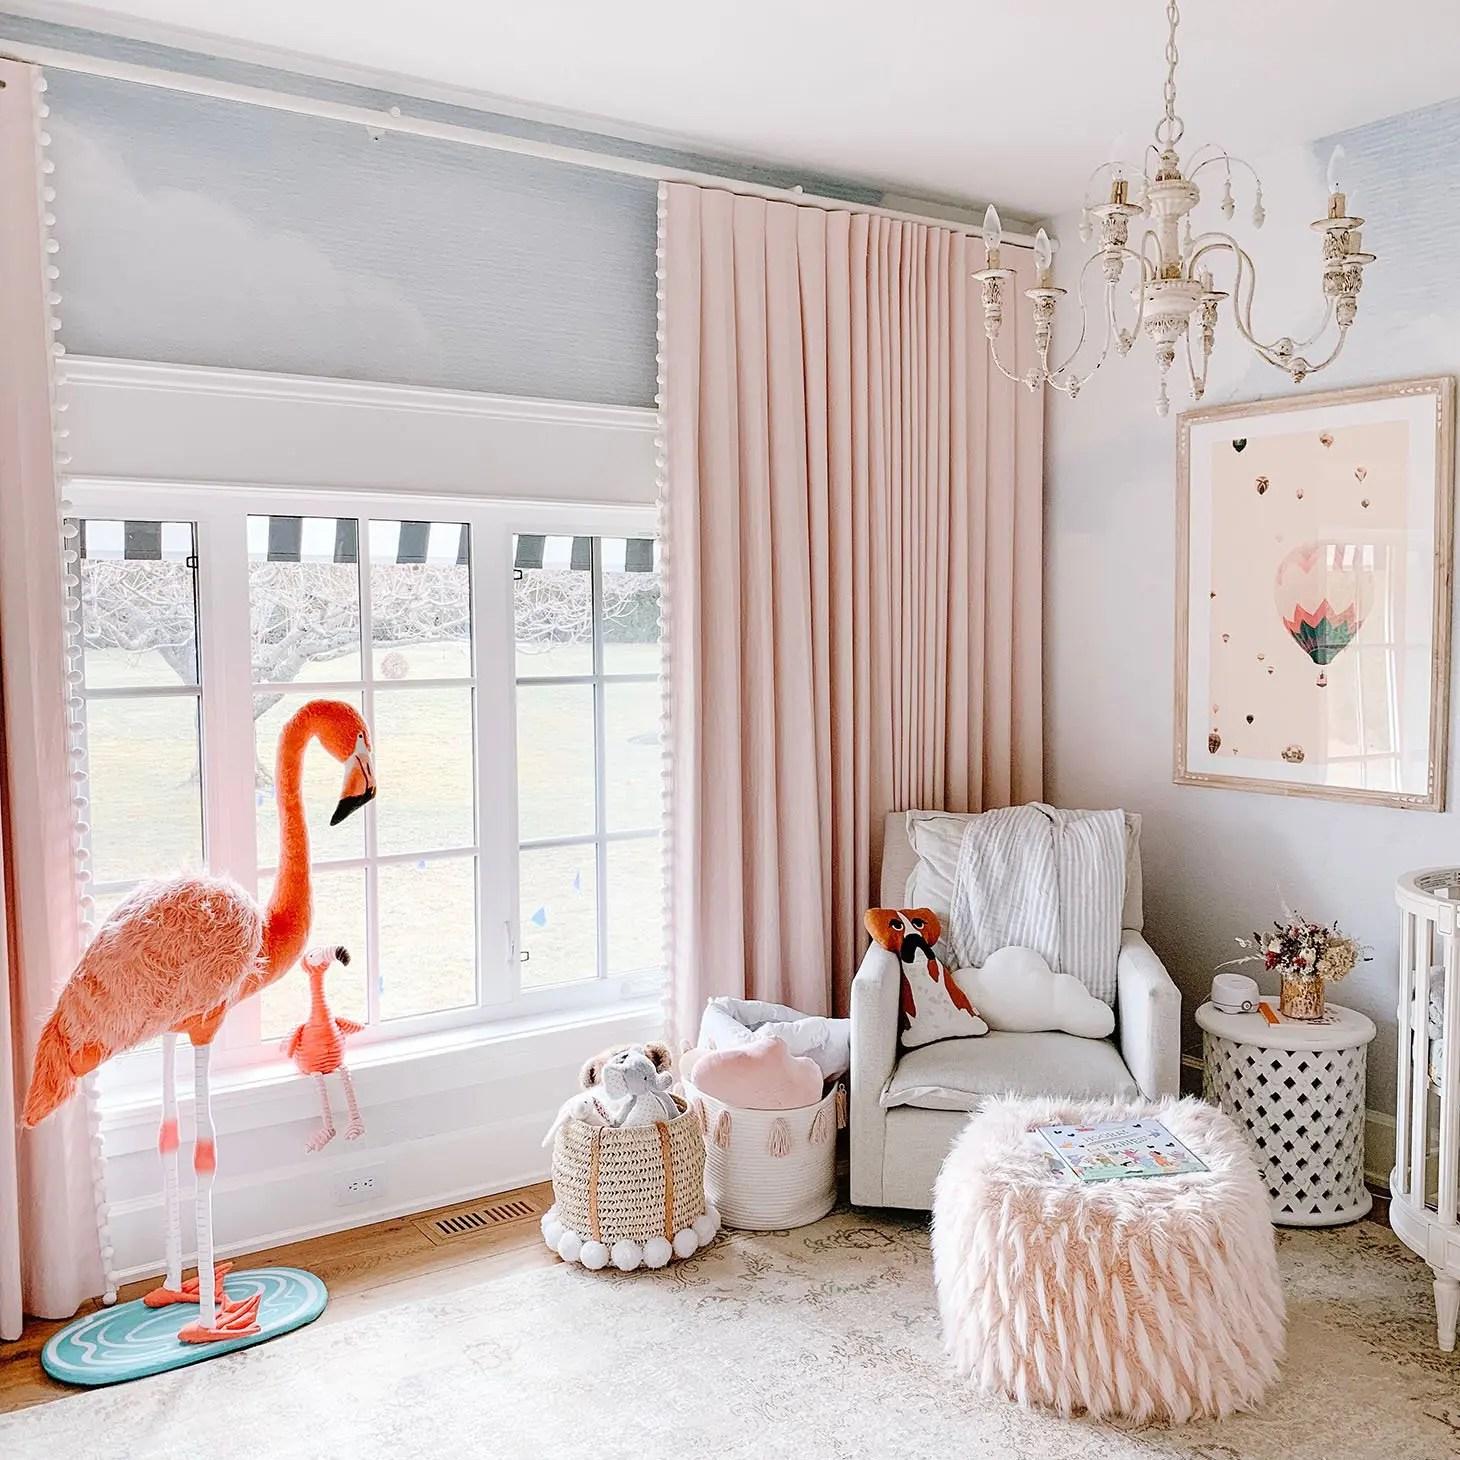 Kids Room Pink Custom Curtains With Pom Pom